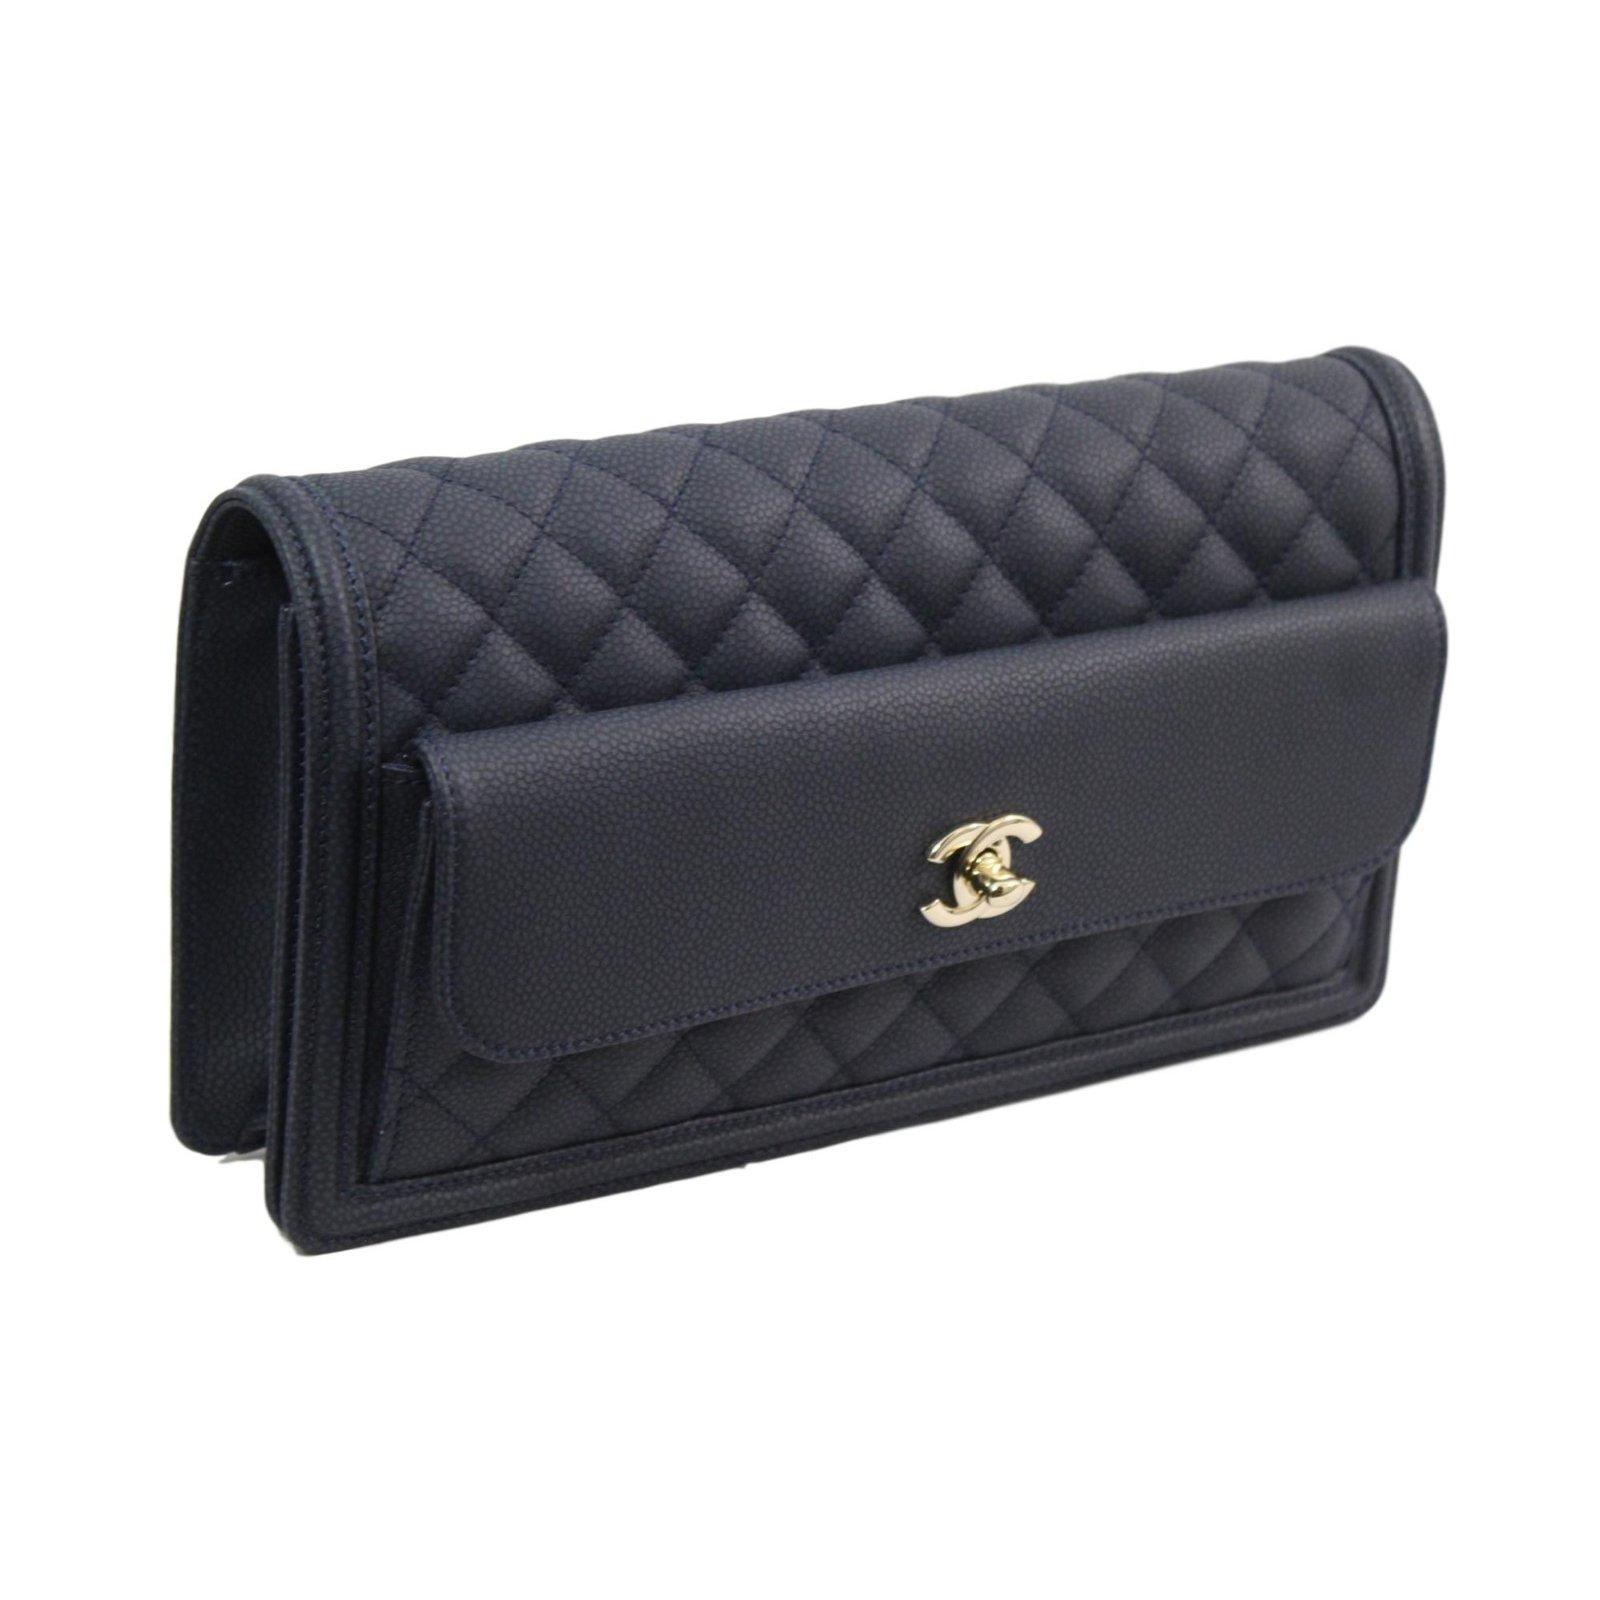 20b7e0a0c5ae8 Chanel Clutch bags Clutch bags Leather Blue ref.75356 - Joli Closet